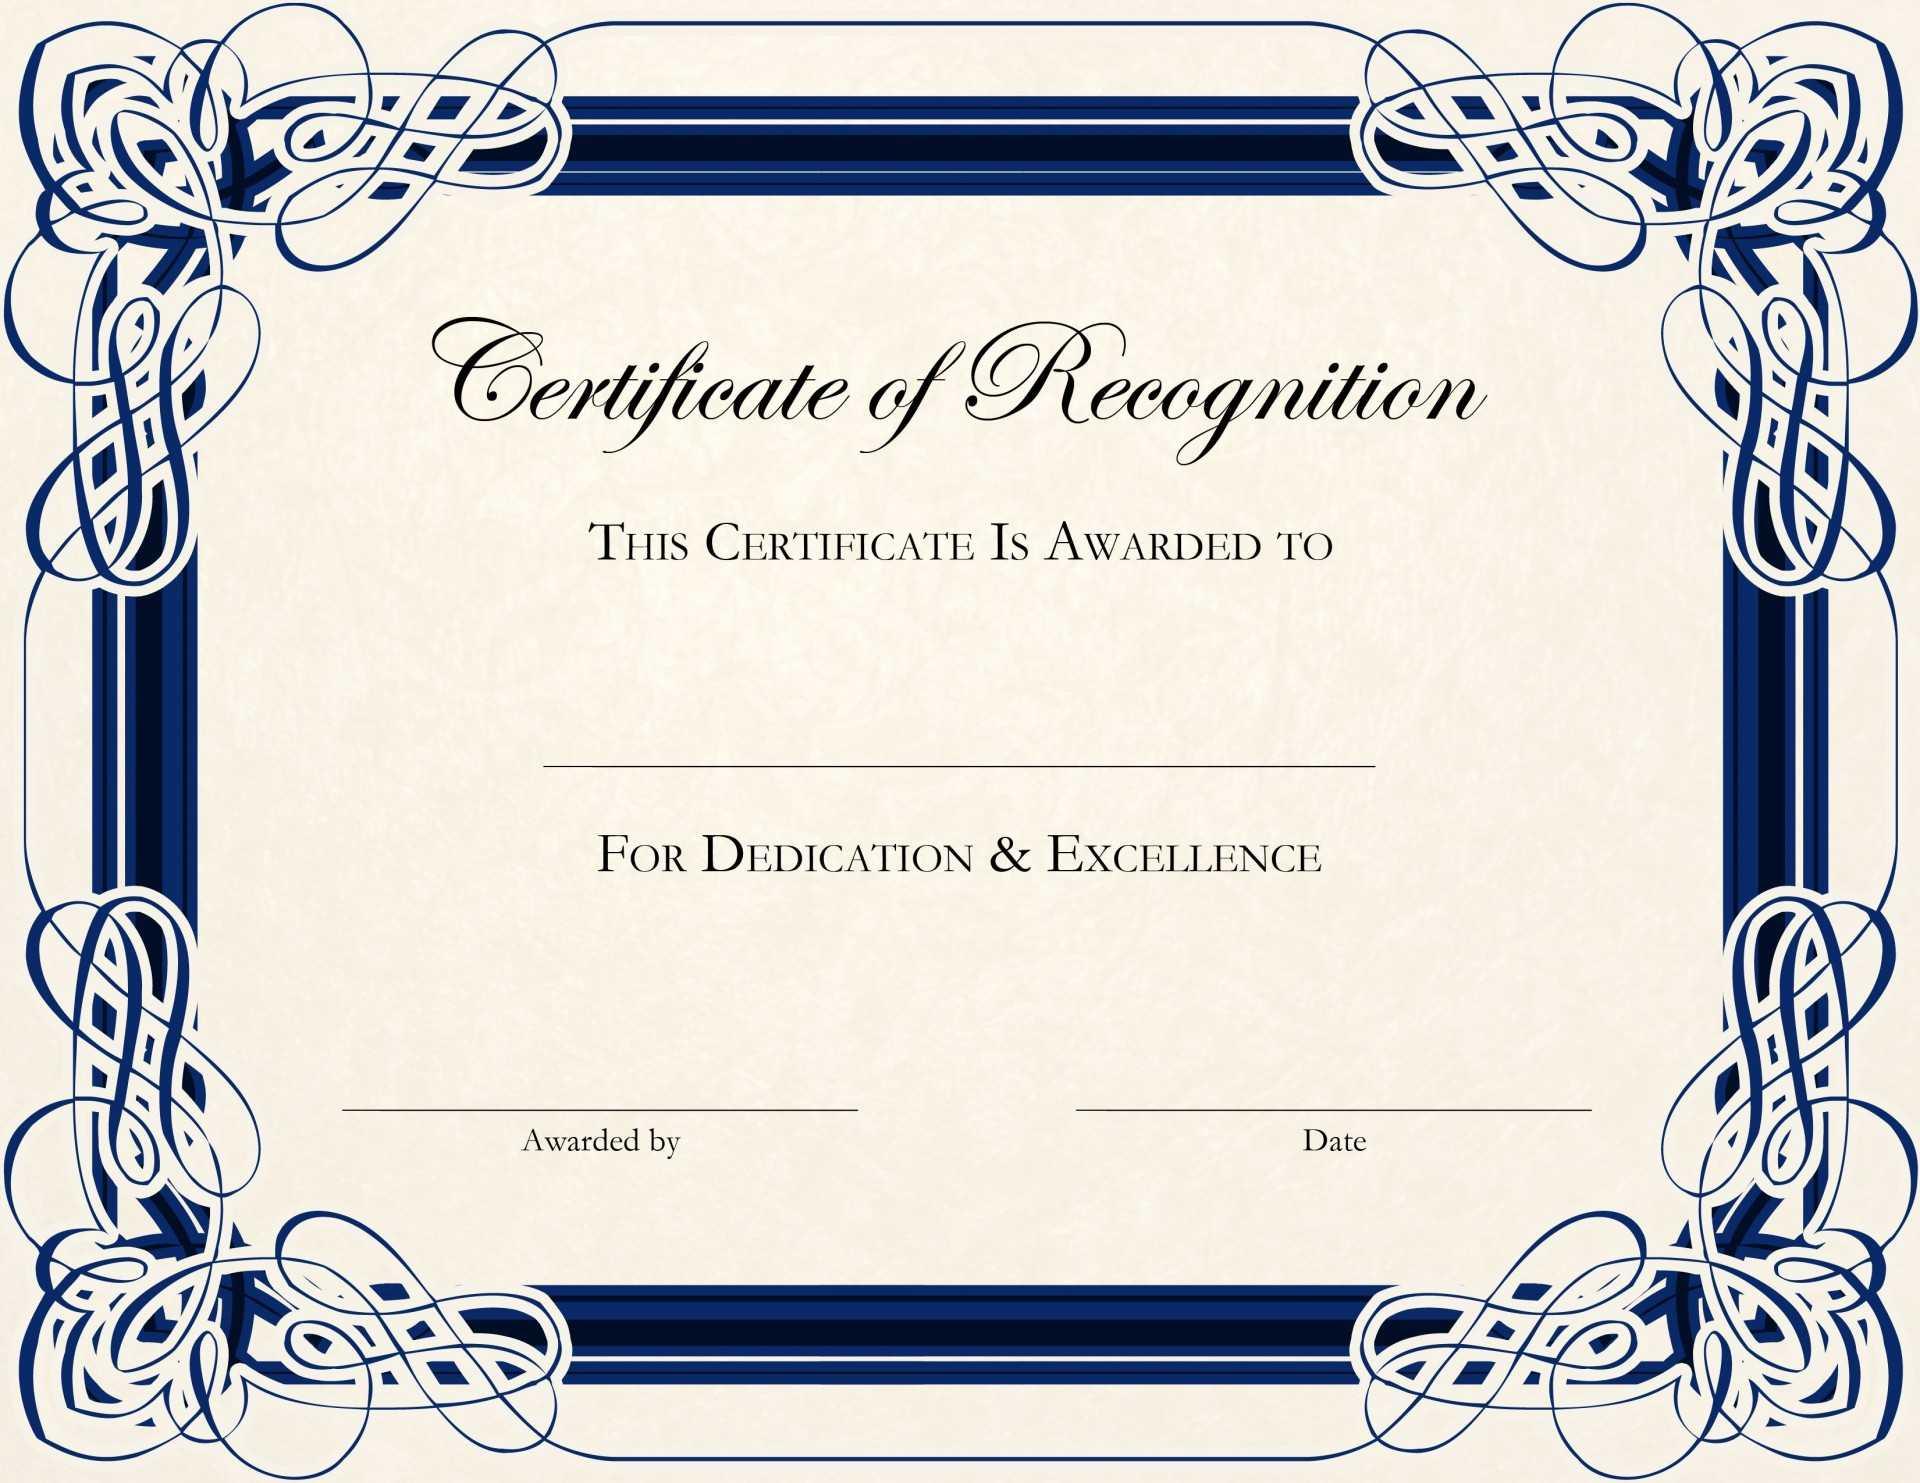 Wonderful Free Printable Certificate Templates Template With Certificate Templates For Word Free Downloads